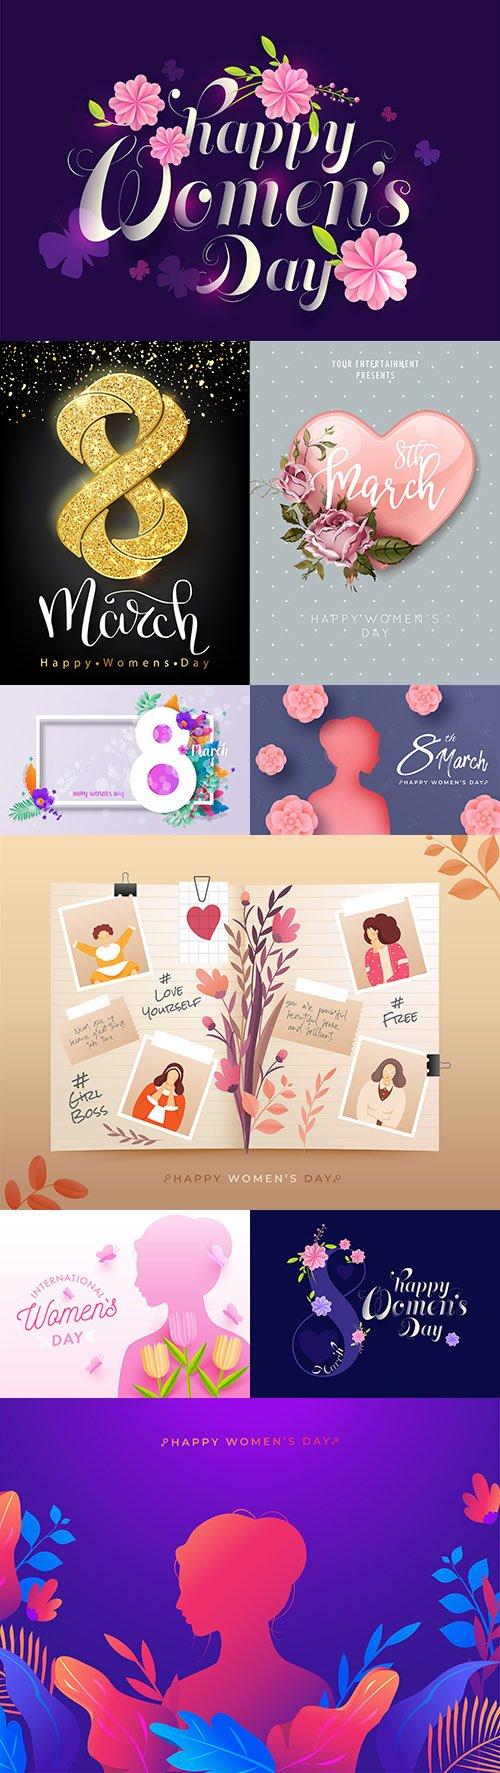 March 8 Women's Day illustration design concept